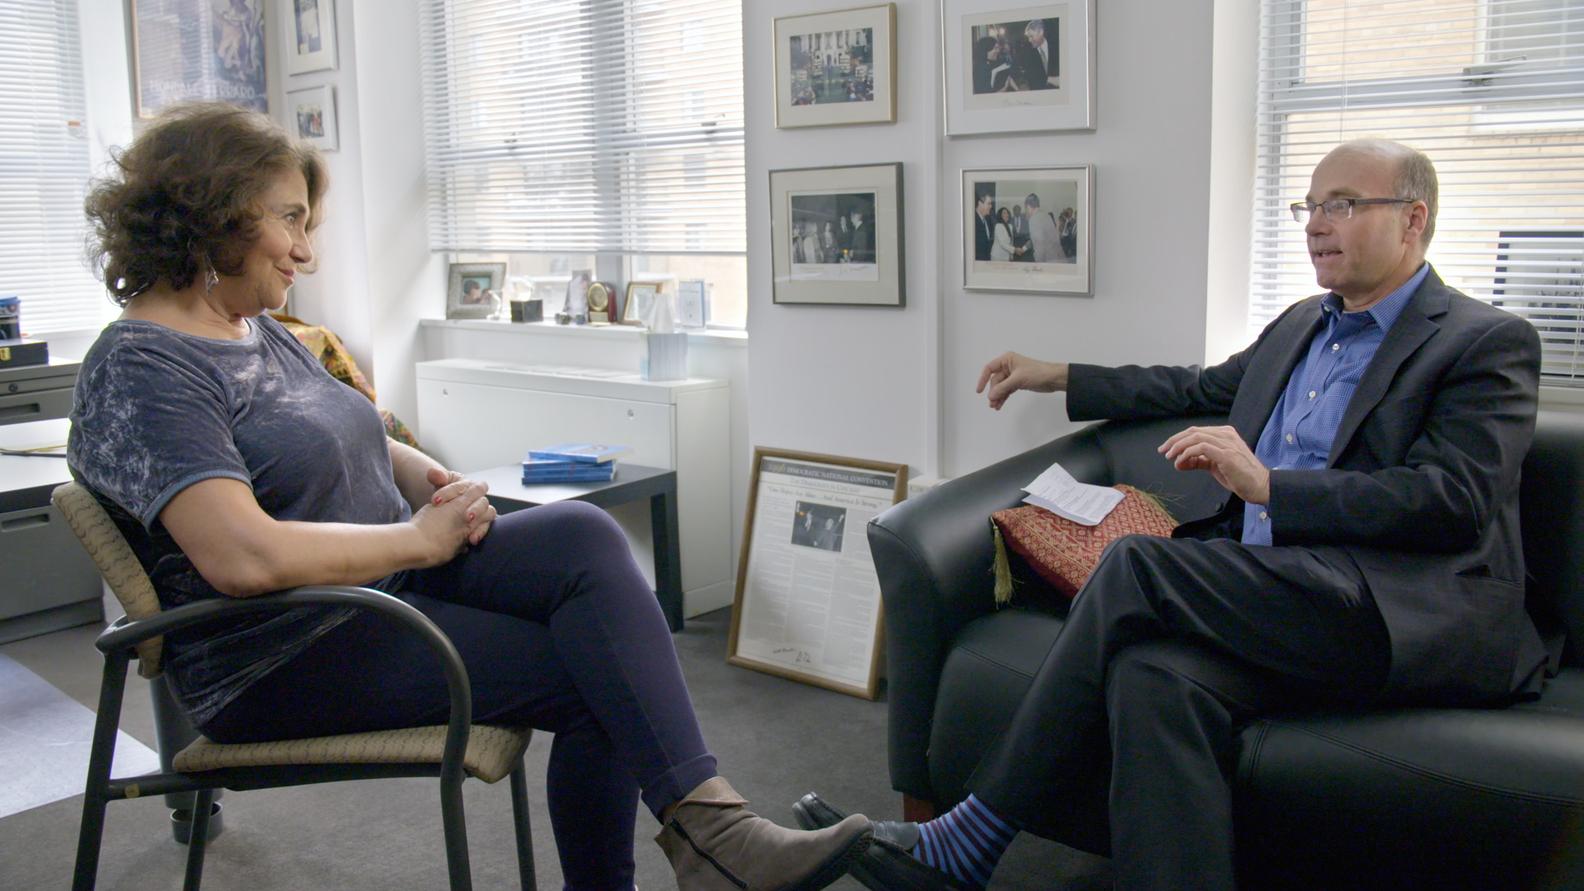 Brookings Institution expert Elaine Kamarck, Axios Co-Founder Mike Allen